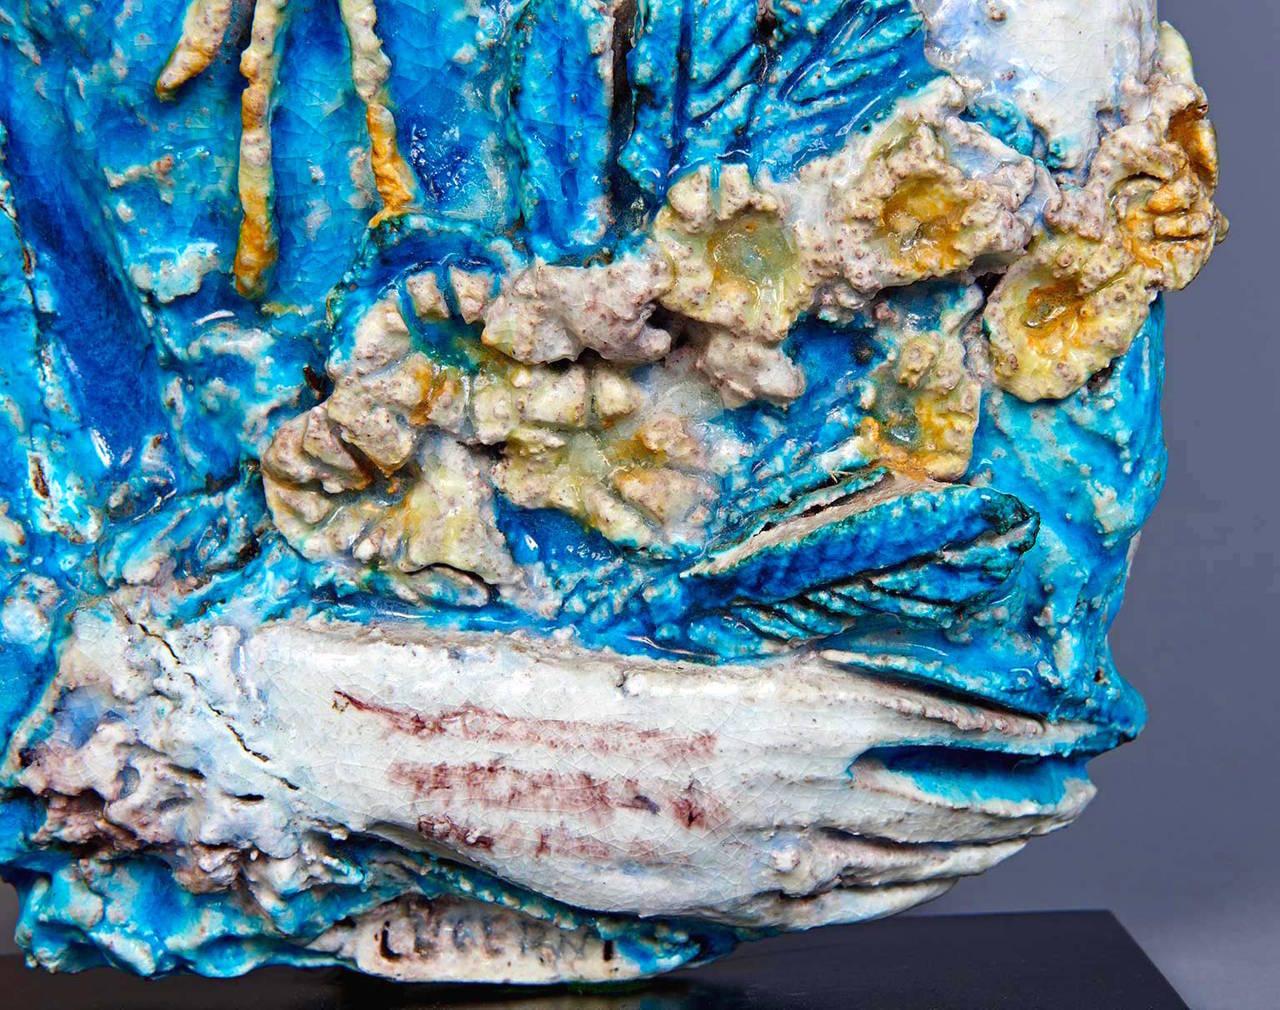 Mid-20th Century Ceramic Sculpture by Ugo Lucerni For Sale